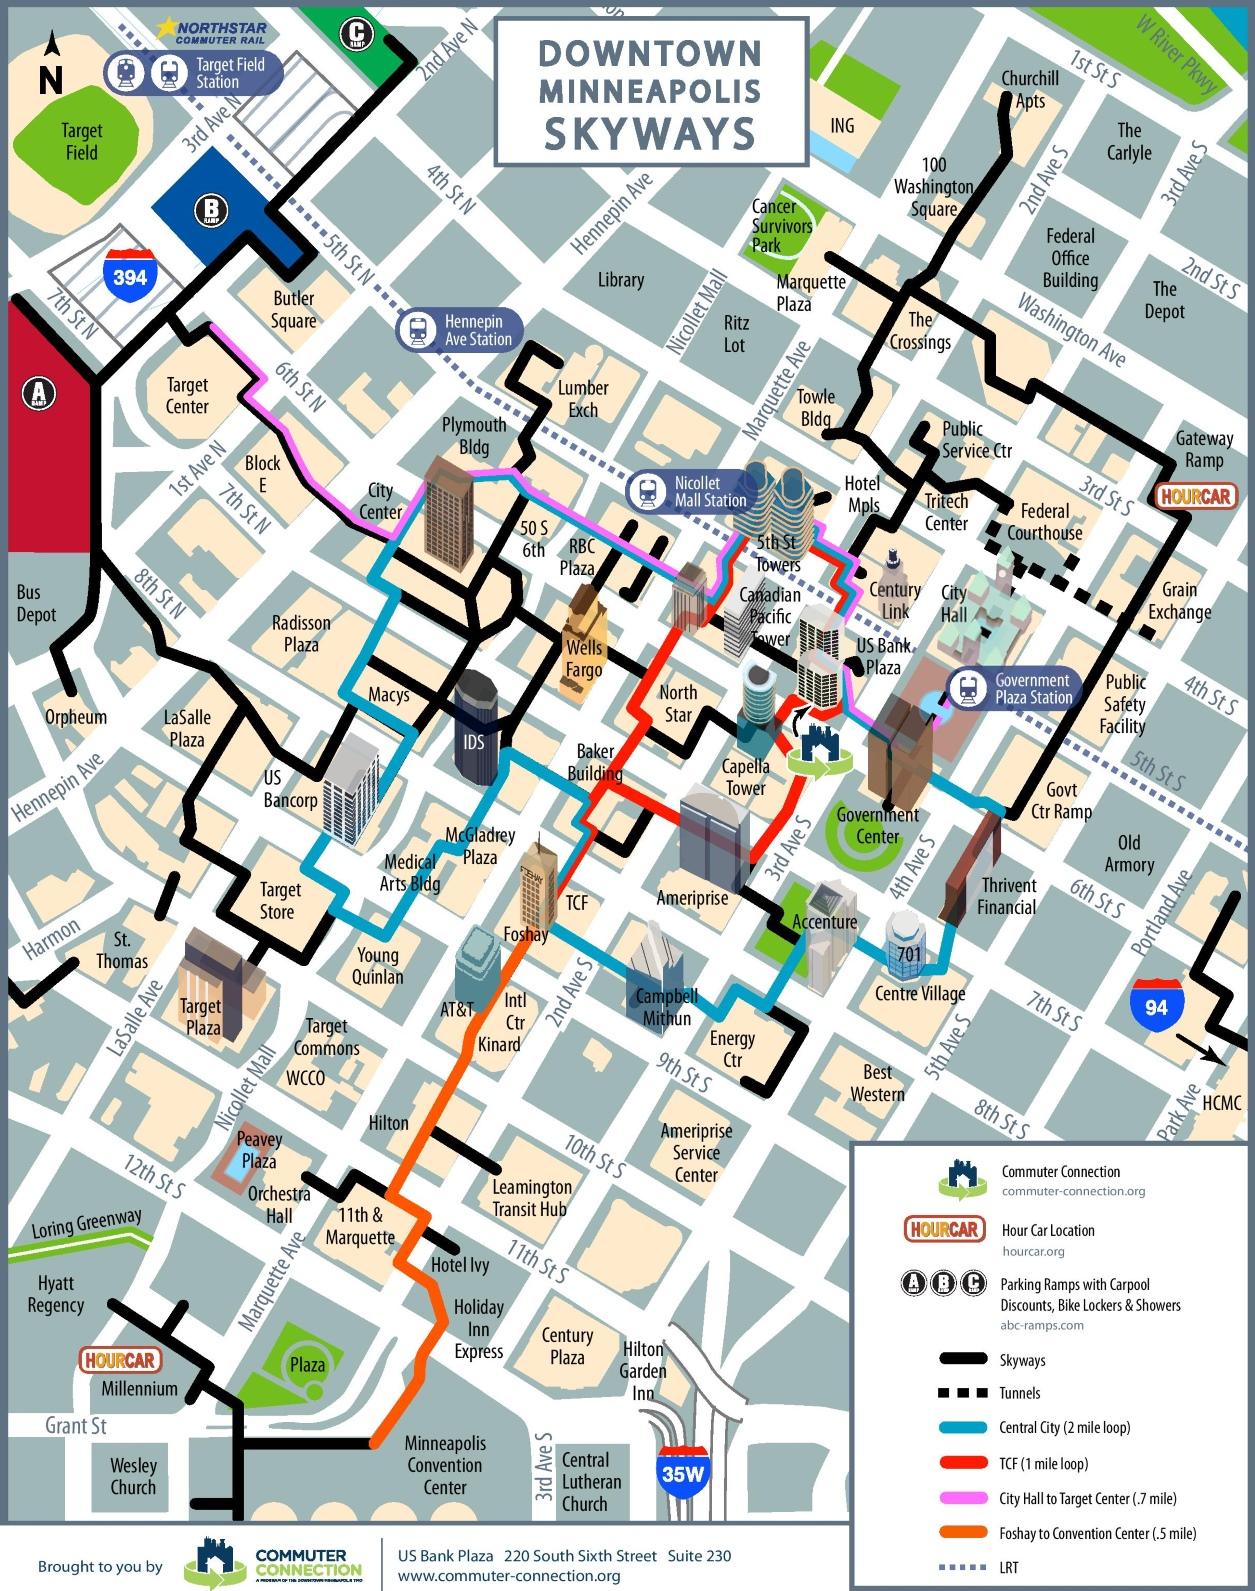 Mpls Skyway Map Minneapolis skyway map Mpls Skyway Map